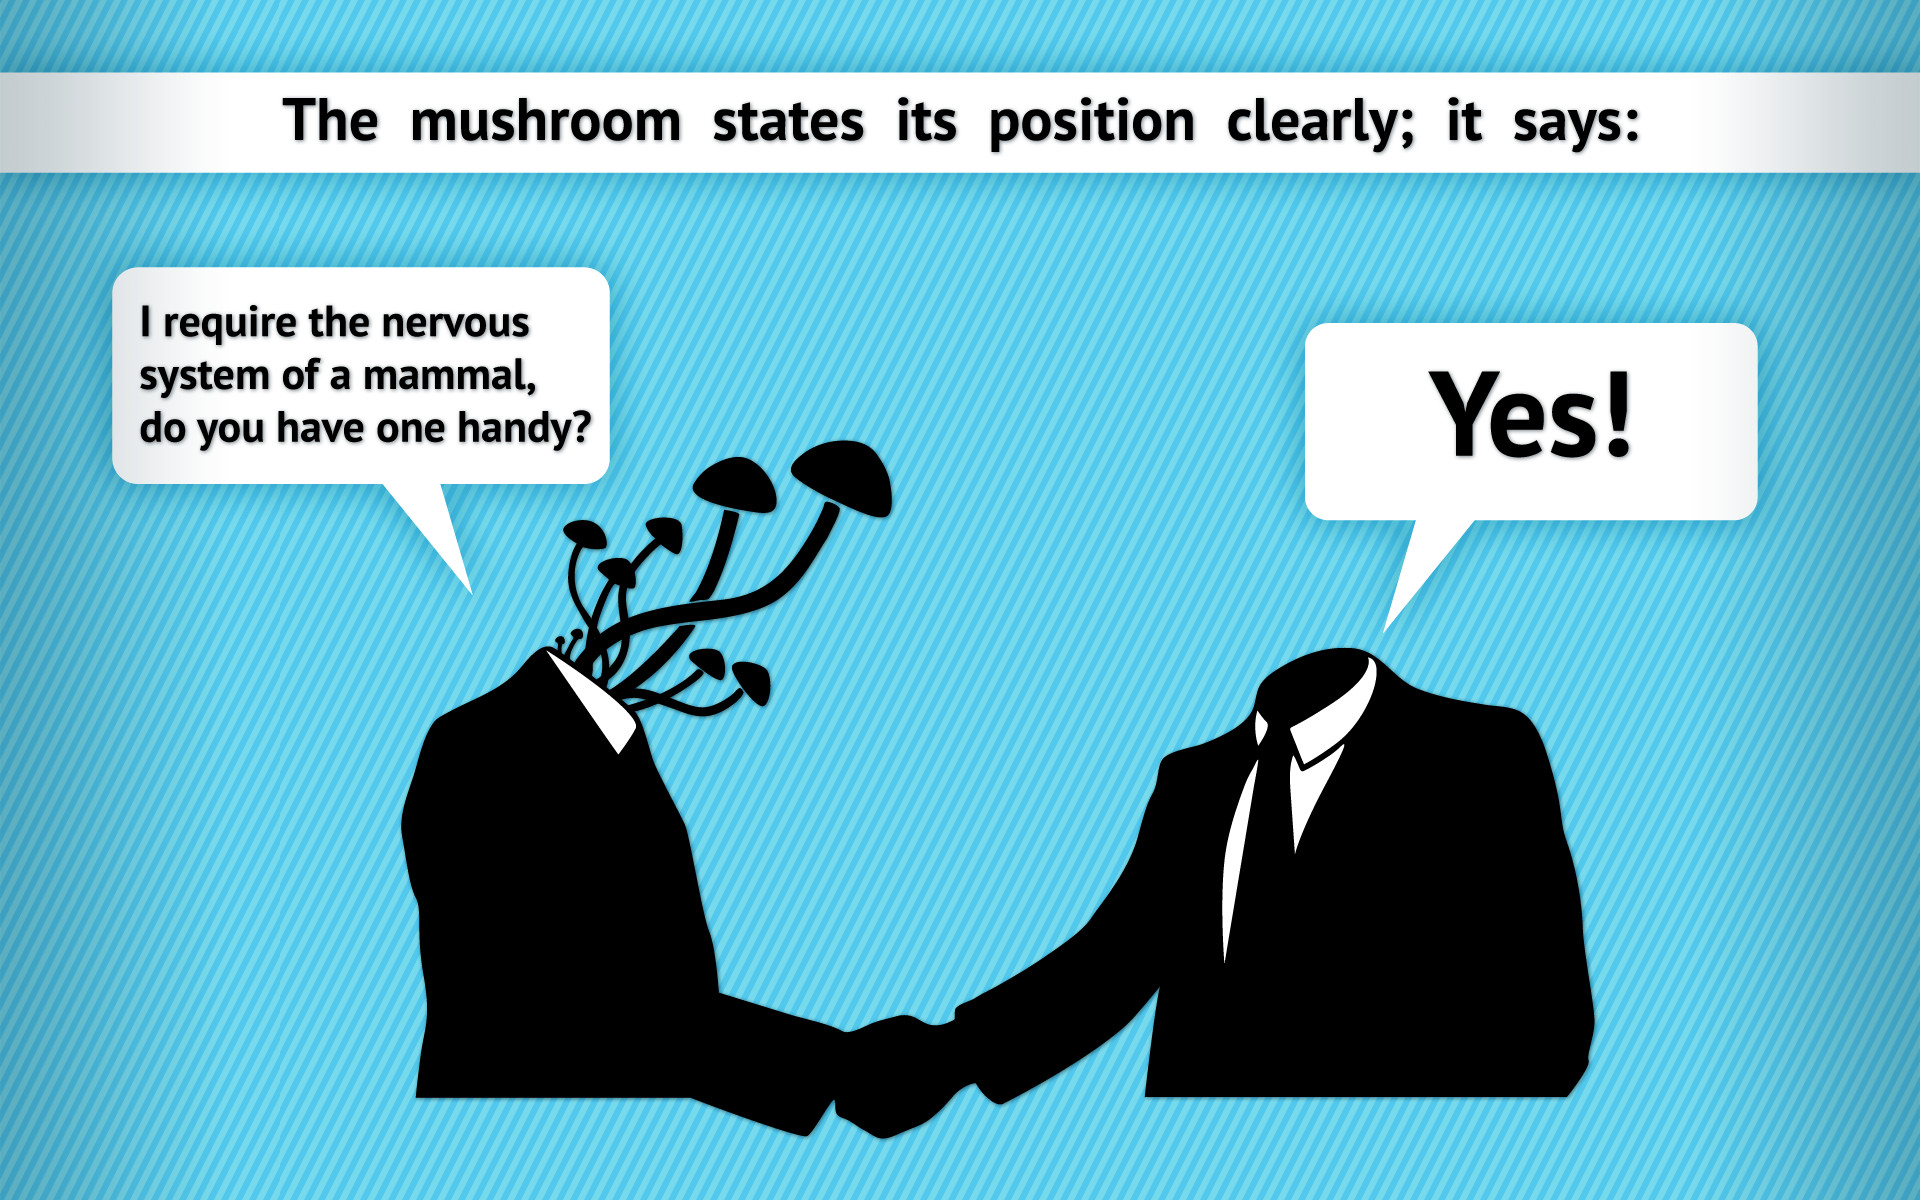 Mushroom Wallpapers Mushroom Wallpapers – Full HD wallpaper search